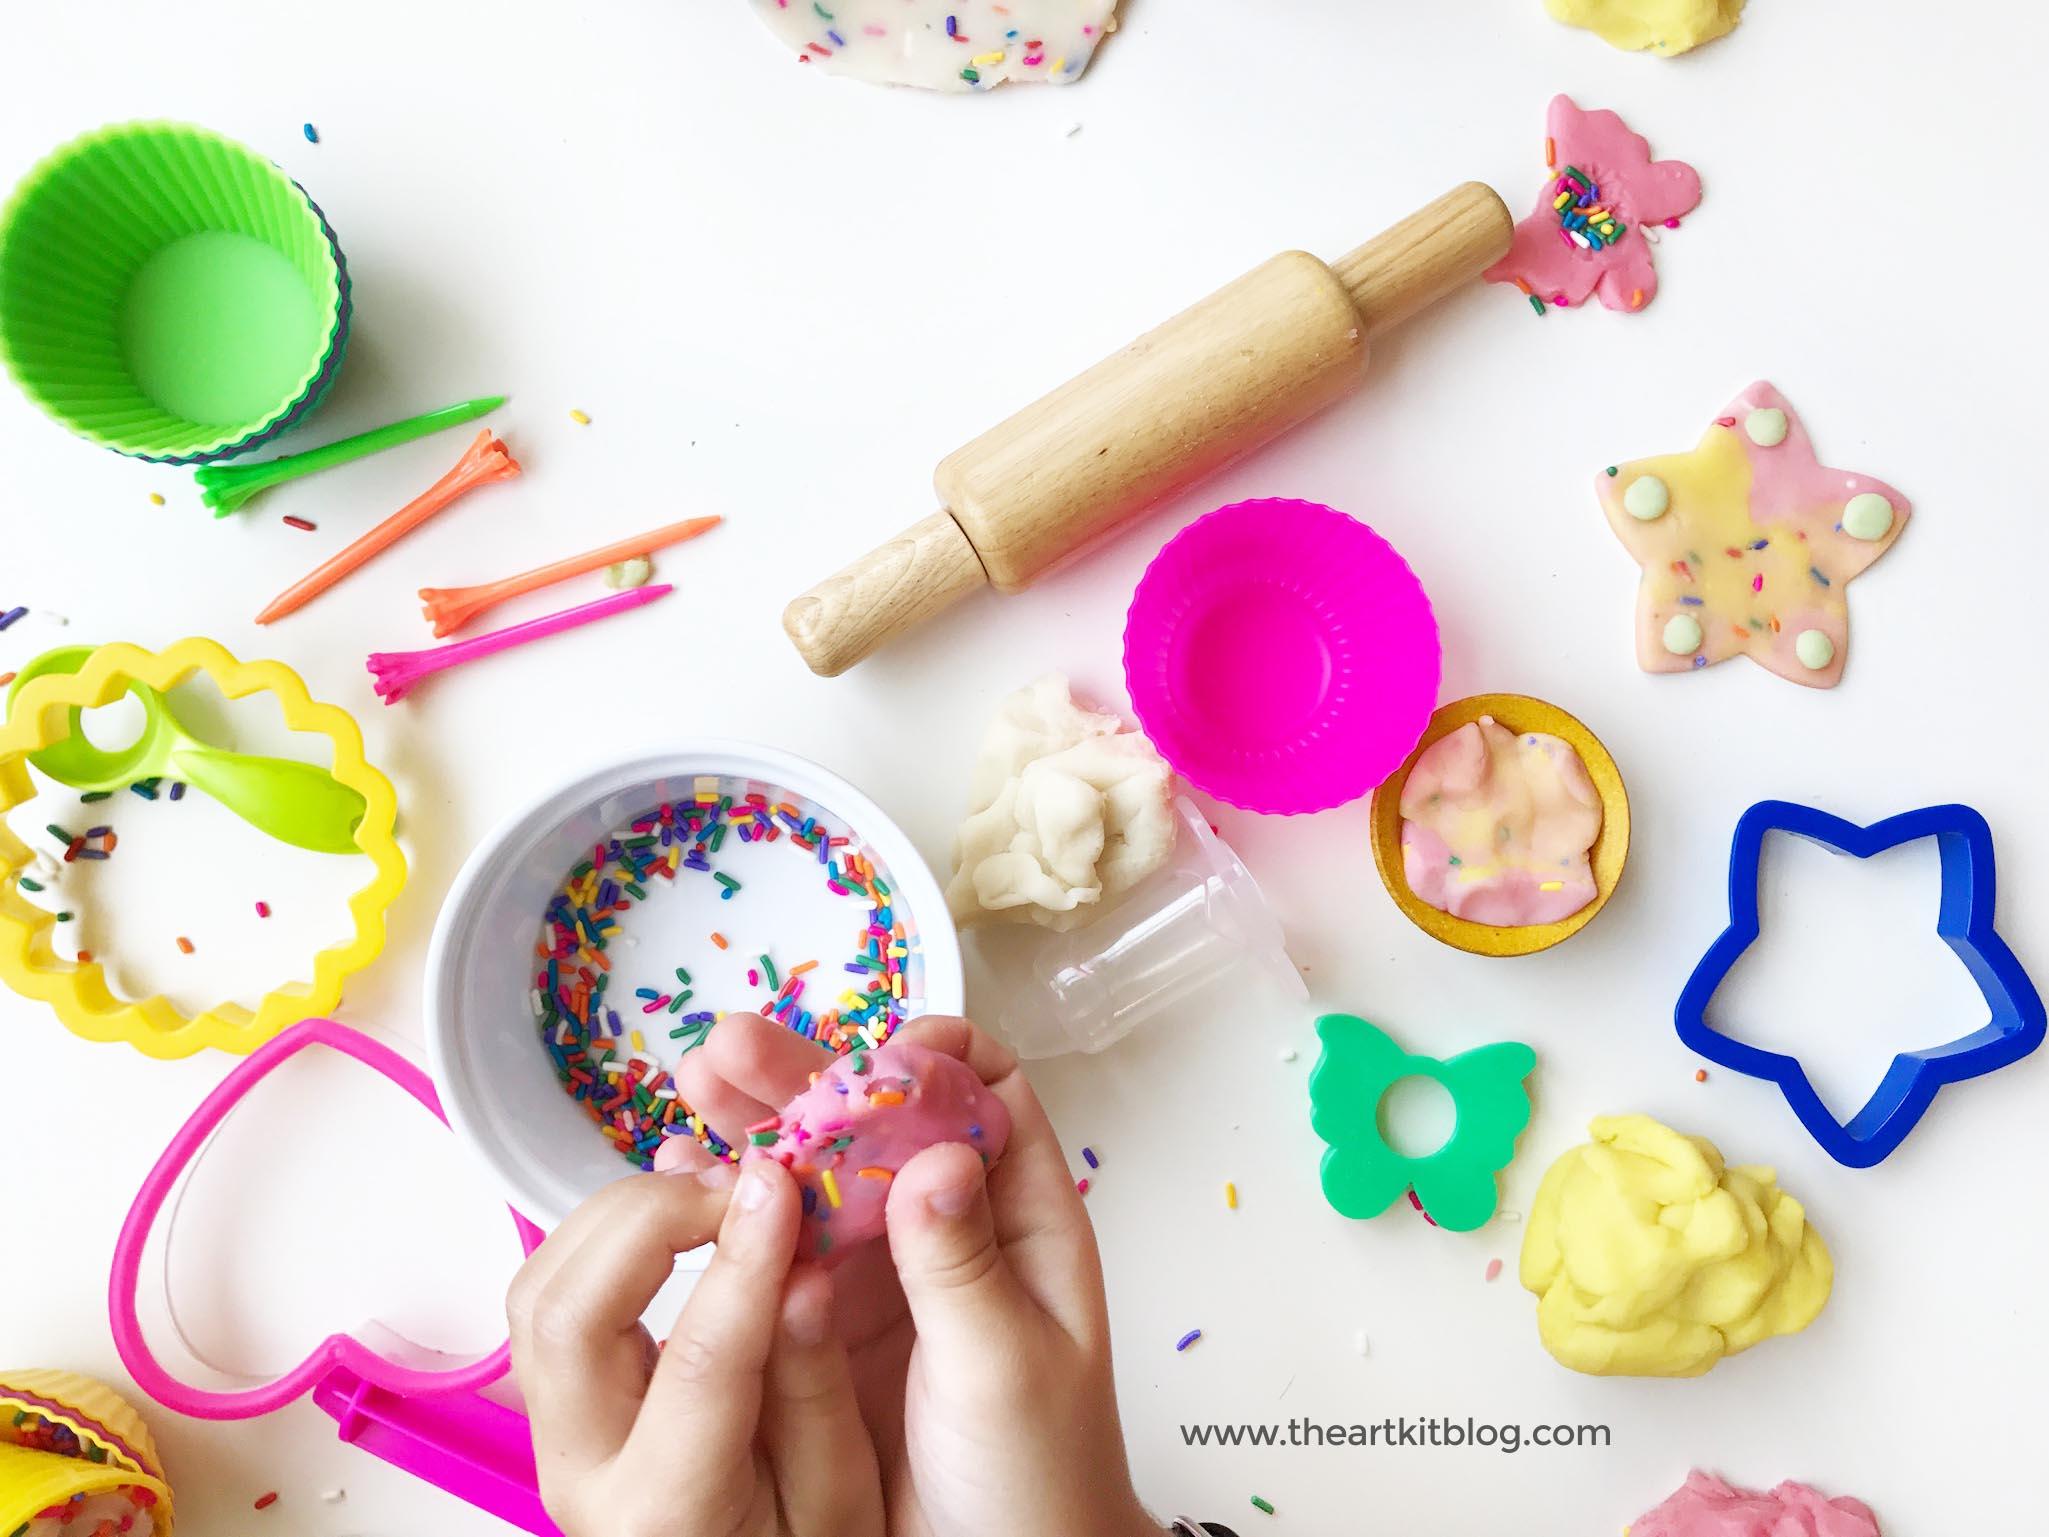 Homemade Playdough With Sprinkles Birthday Party The Art Kit Blog